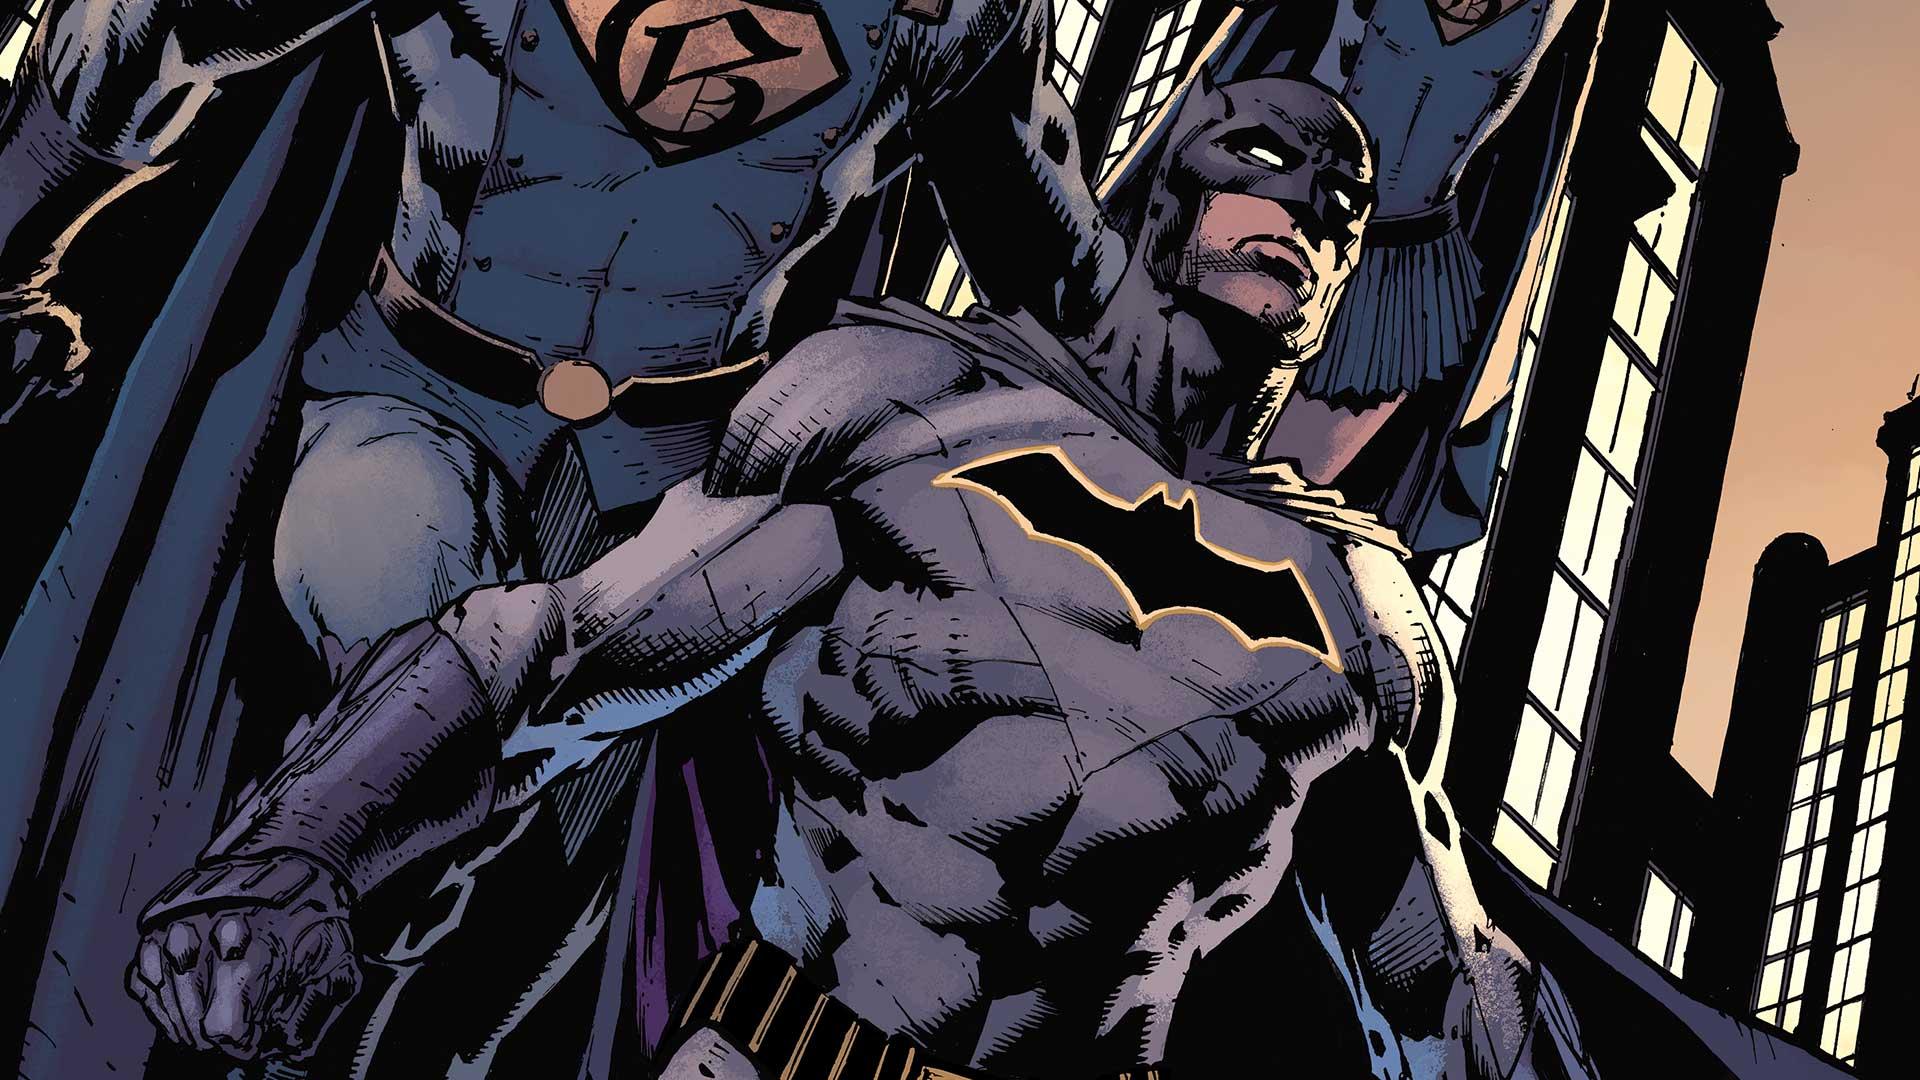 Batman's new creative team begins next year